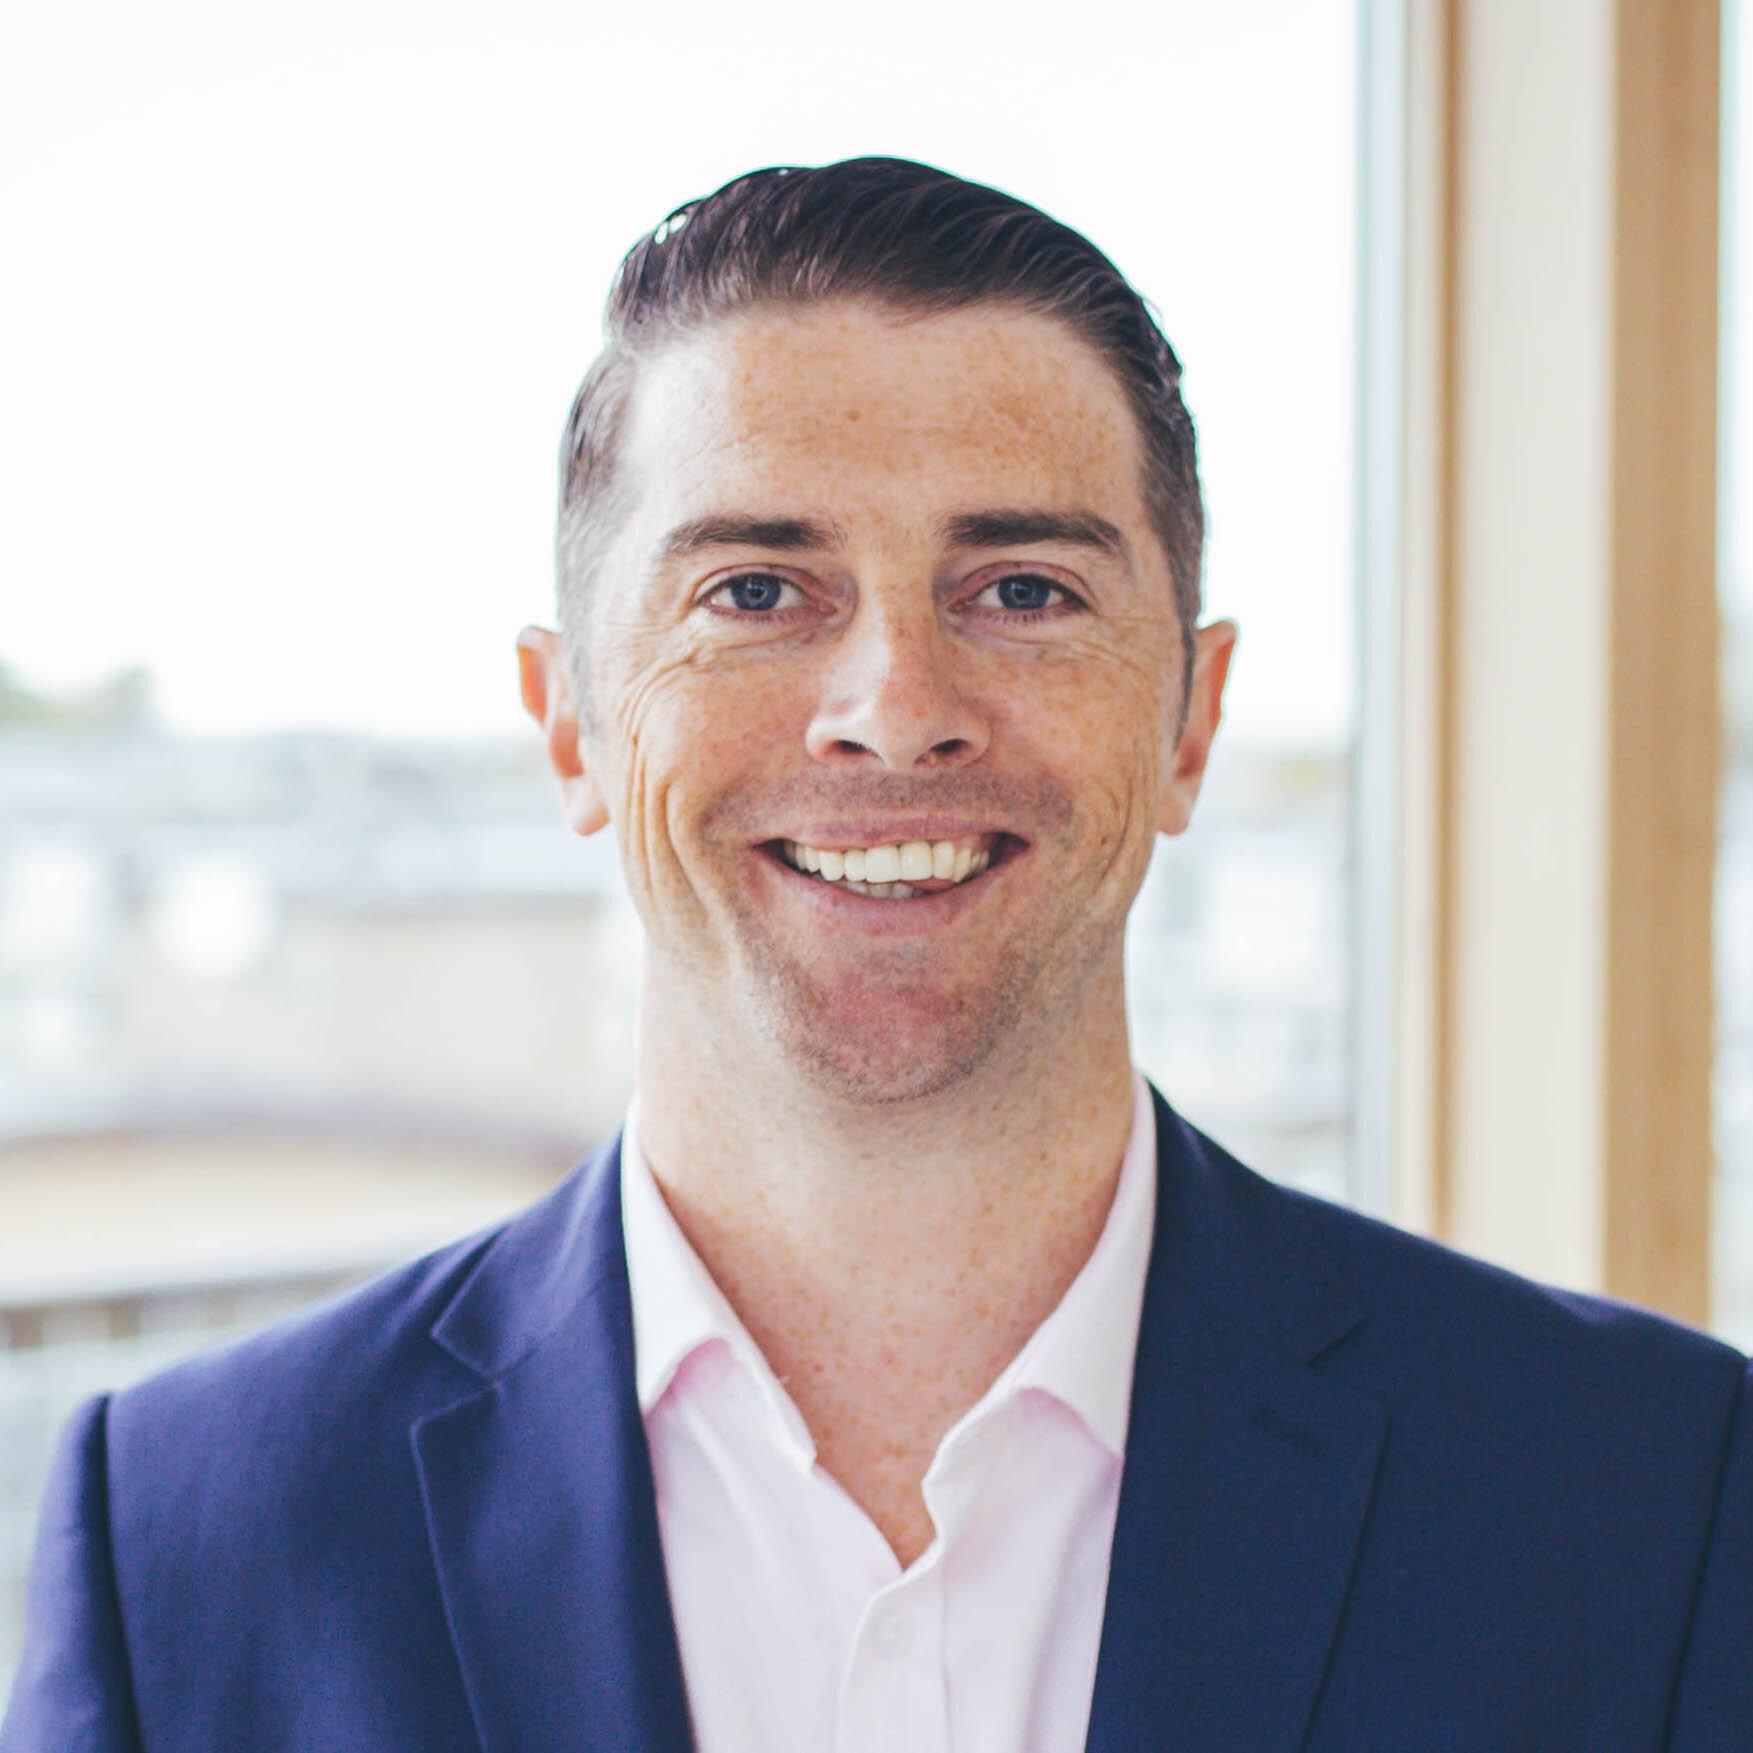 Conor Scanlon, Portfolio Manager